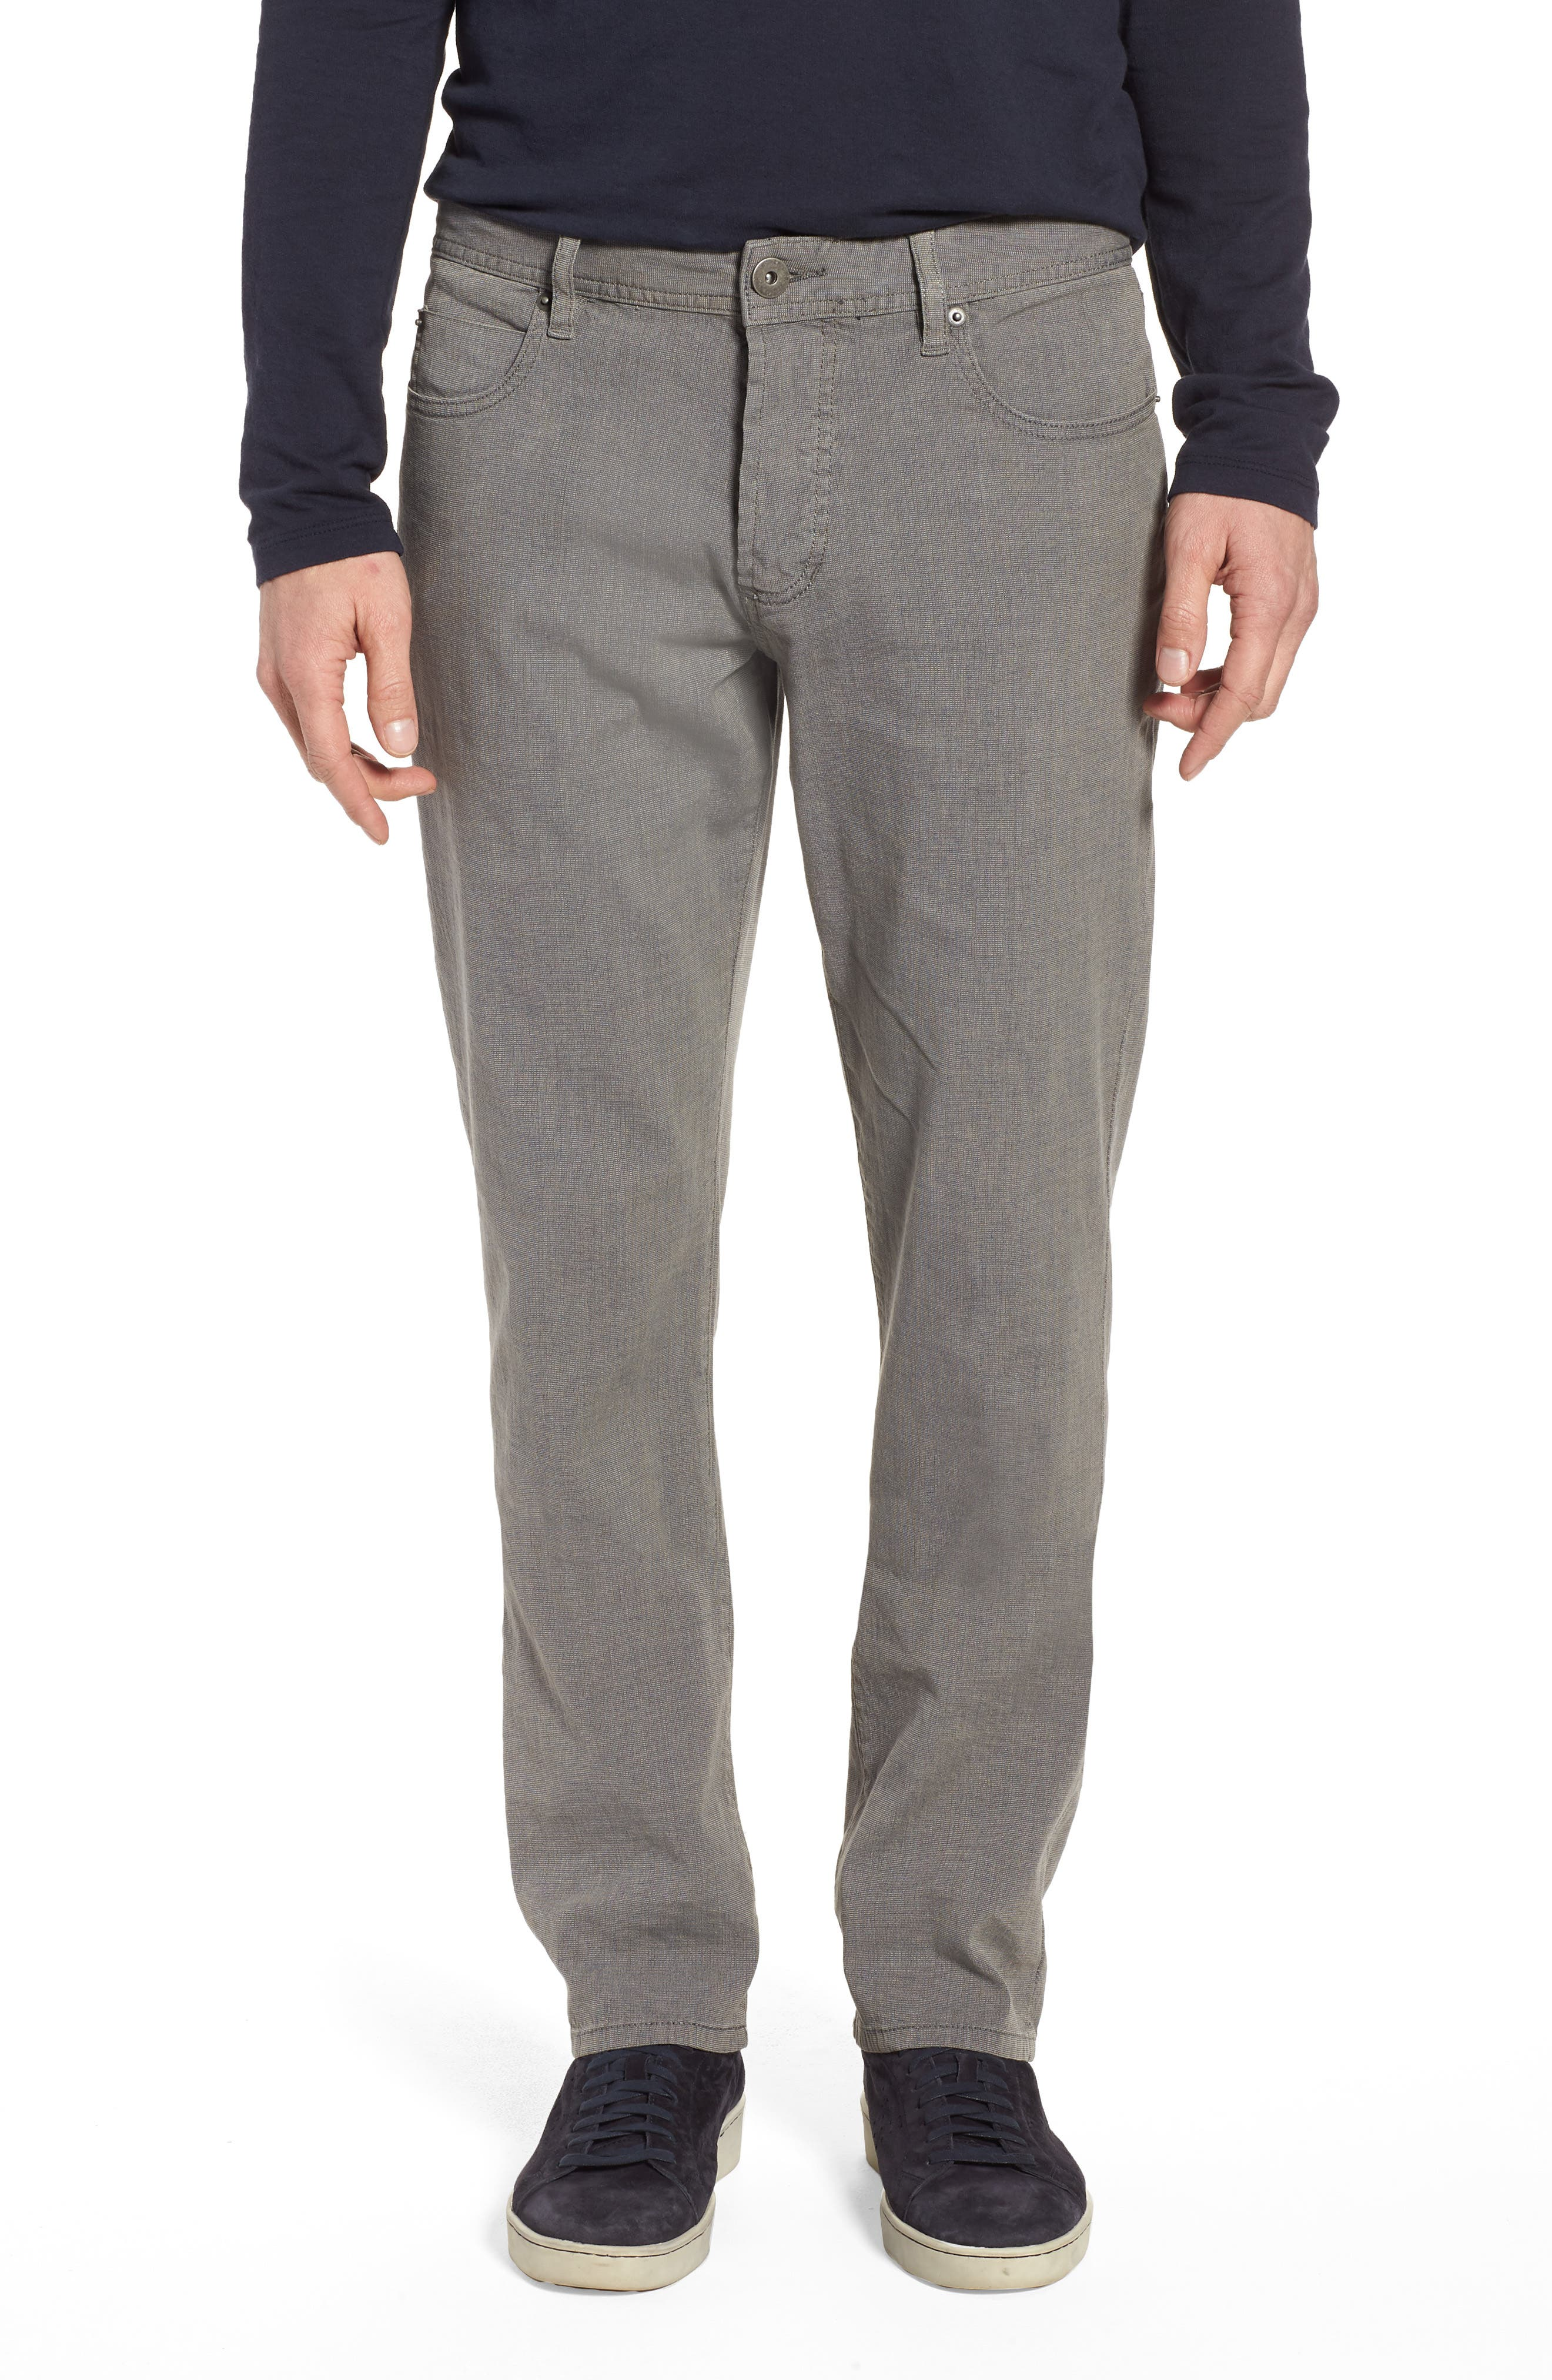 Straight Leg Five-Pocket Pants,                             Main thumbnail 1, color,                             Grey